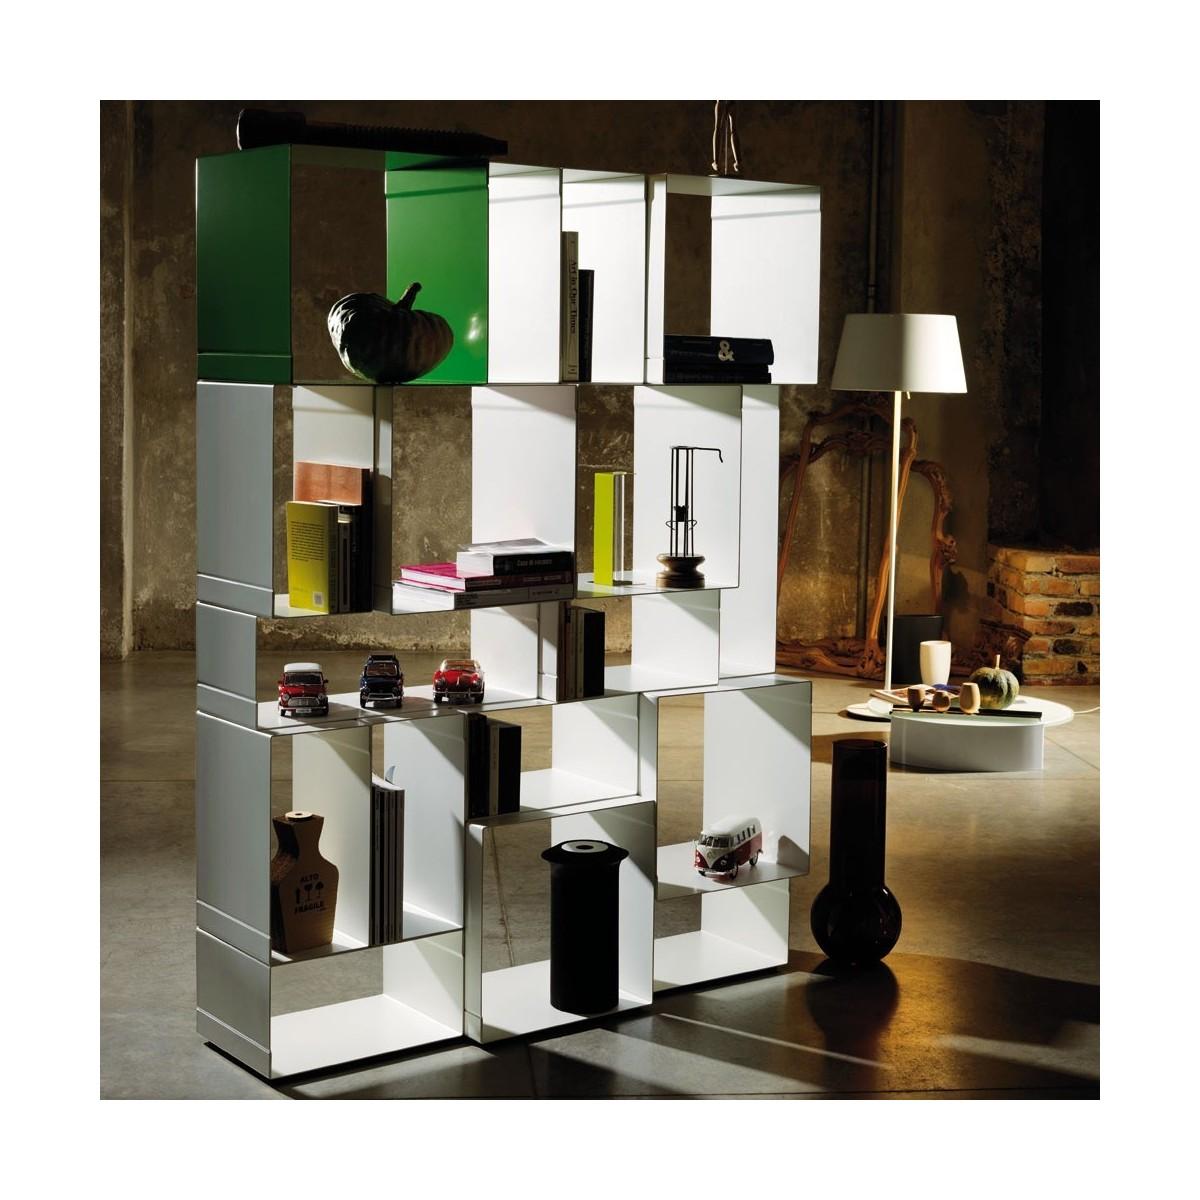 Libreria scaffalatura modulare in acciaio kubica for Libreria acciaio e vetro